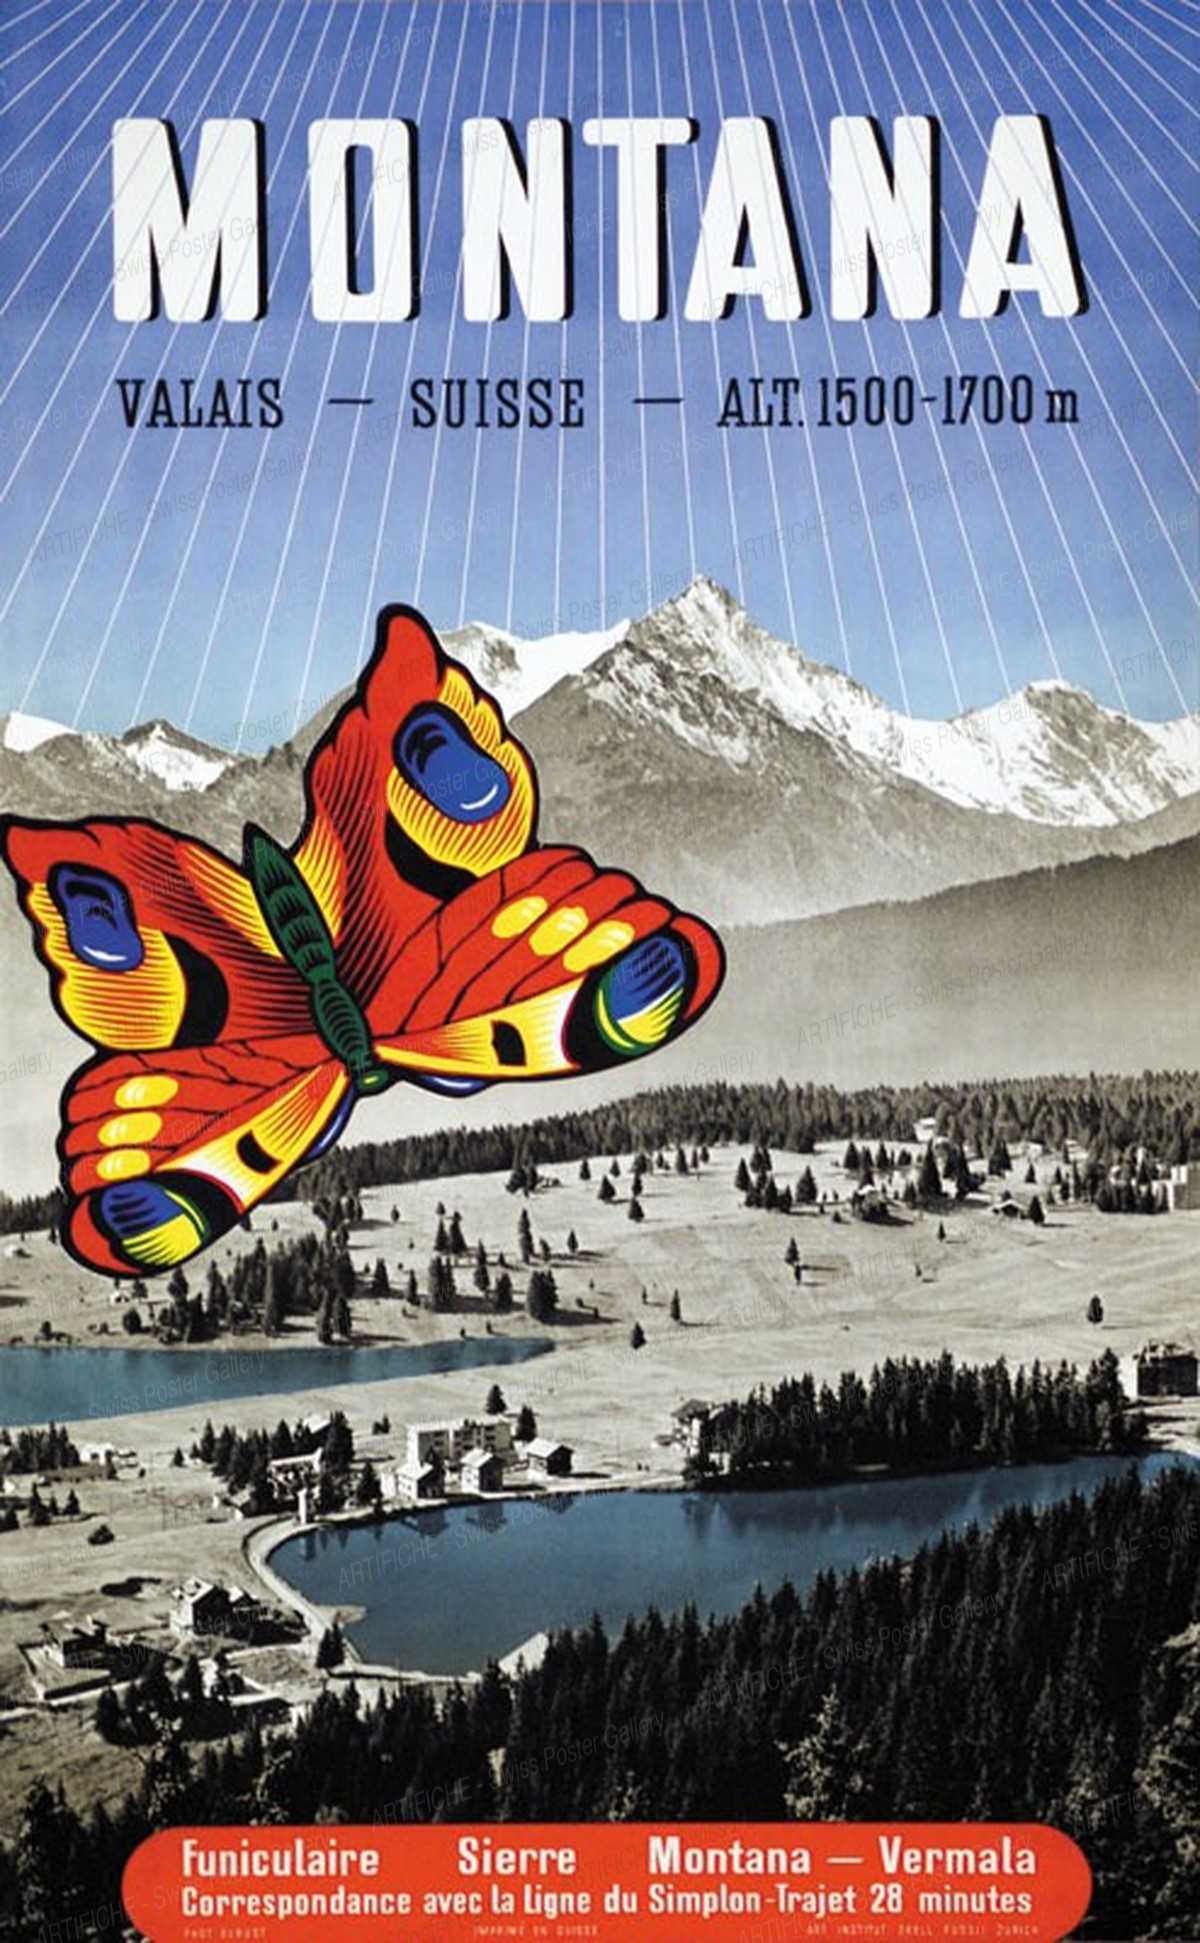 Montana Vermala Valais, Dubost (Photo)